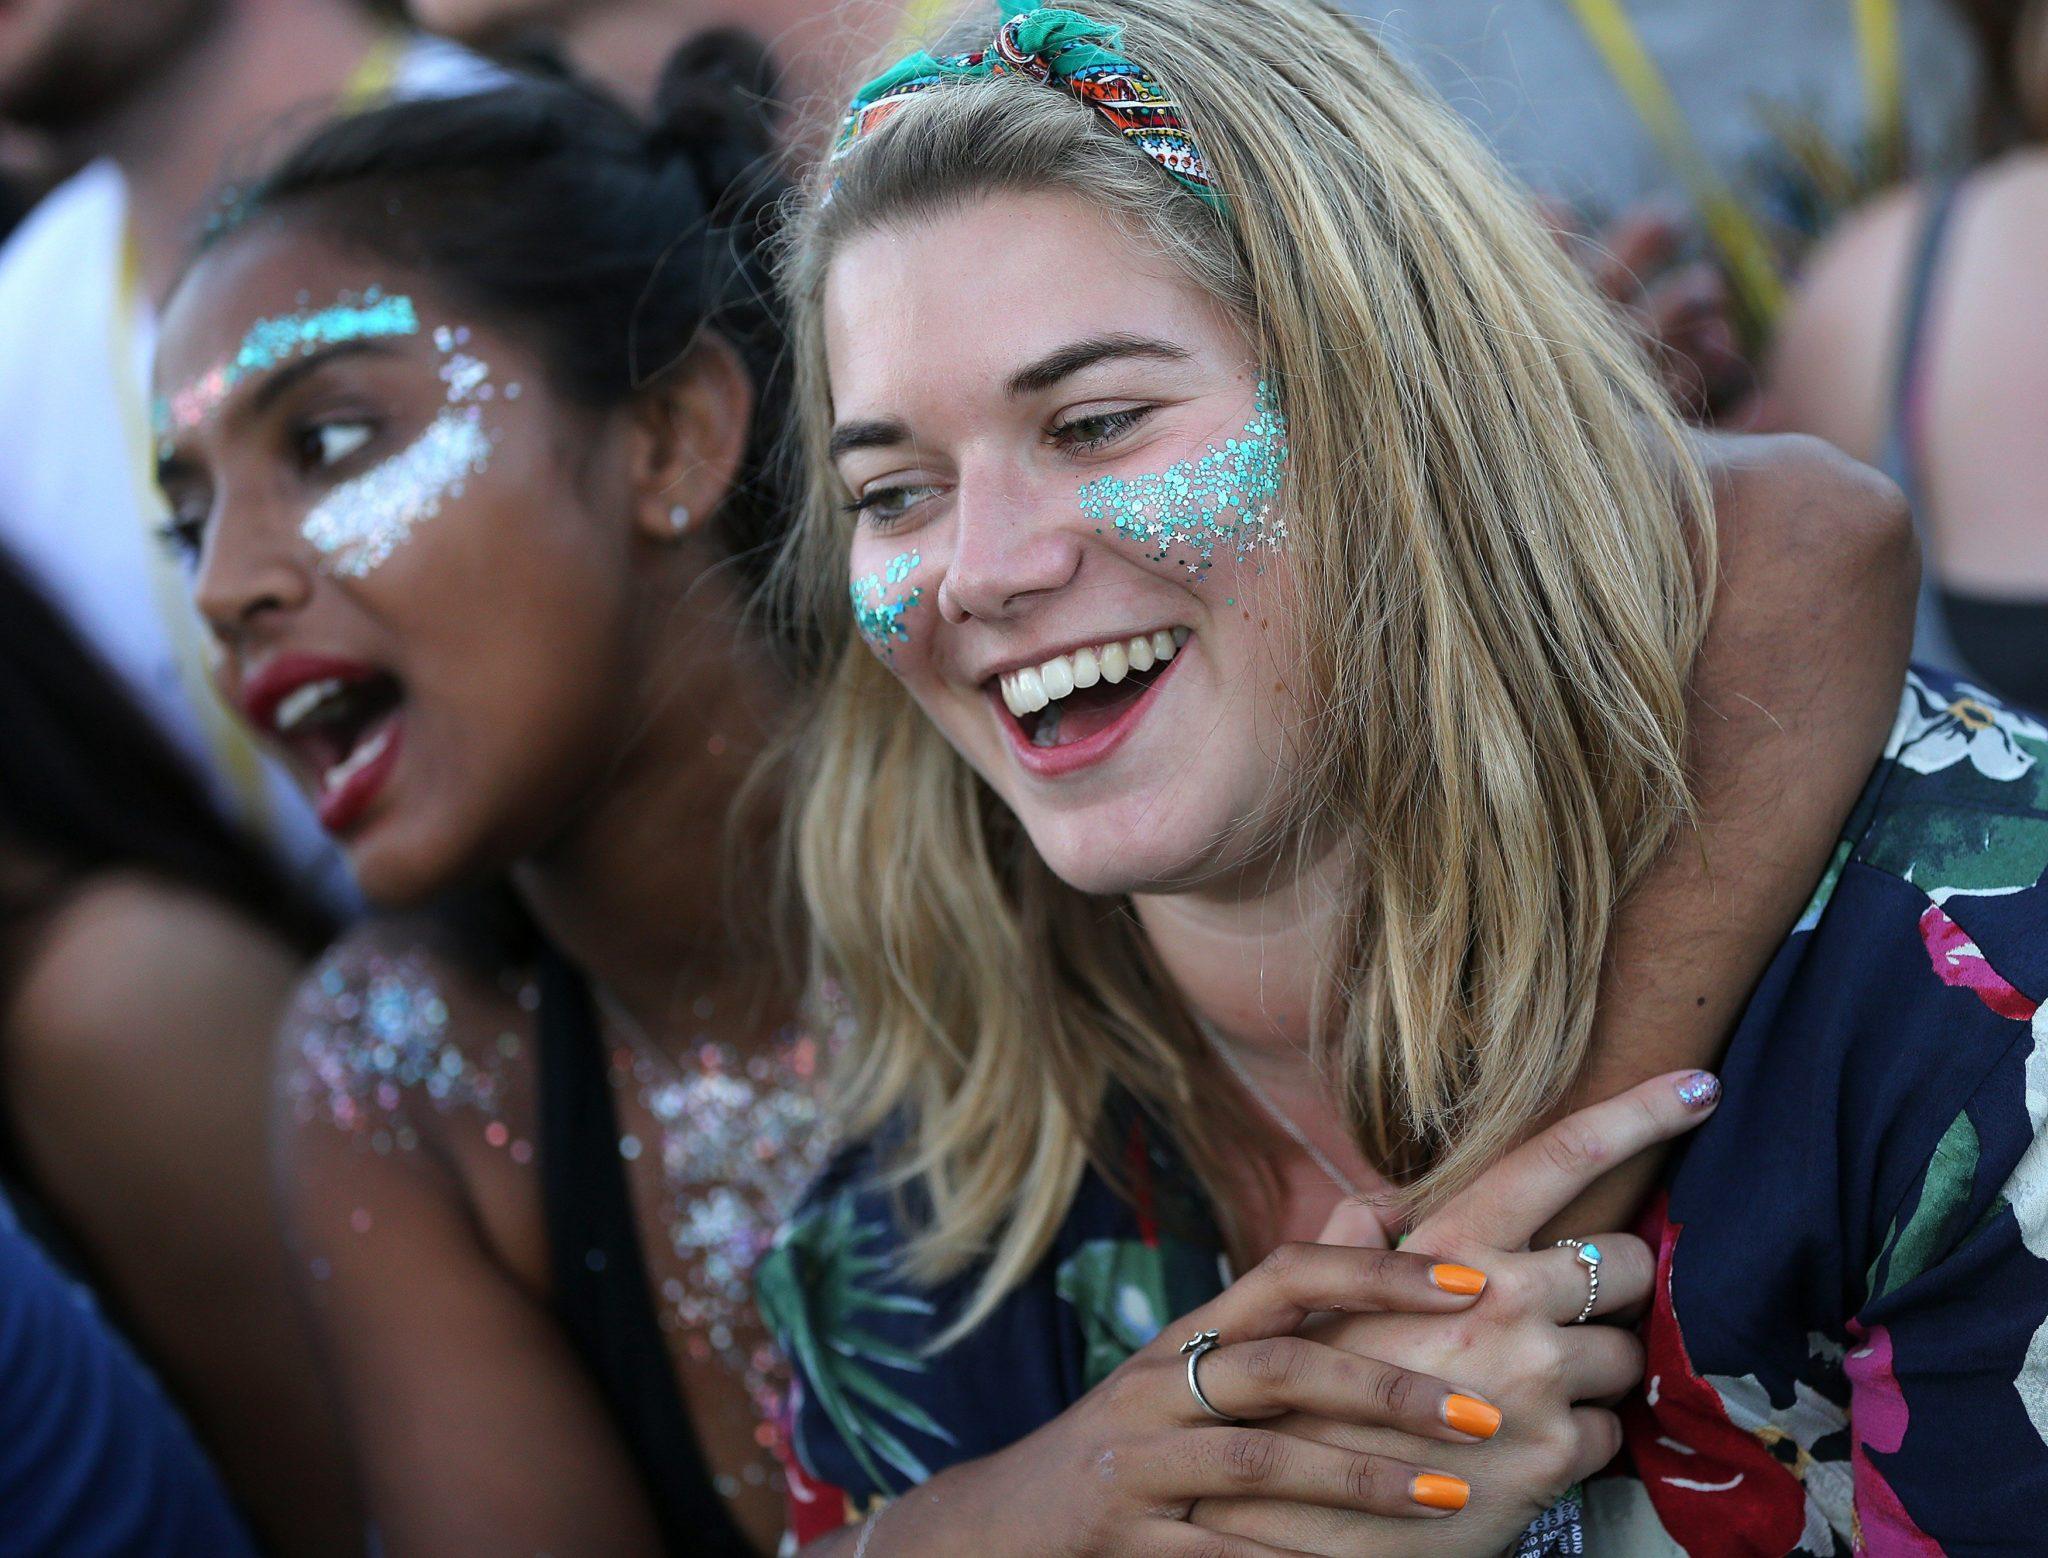 Festiwal Glastonbury, fot: Nigel Roddis, PAP/EPA.